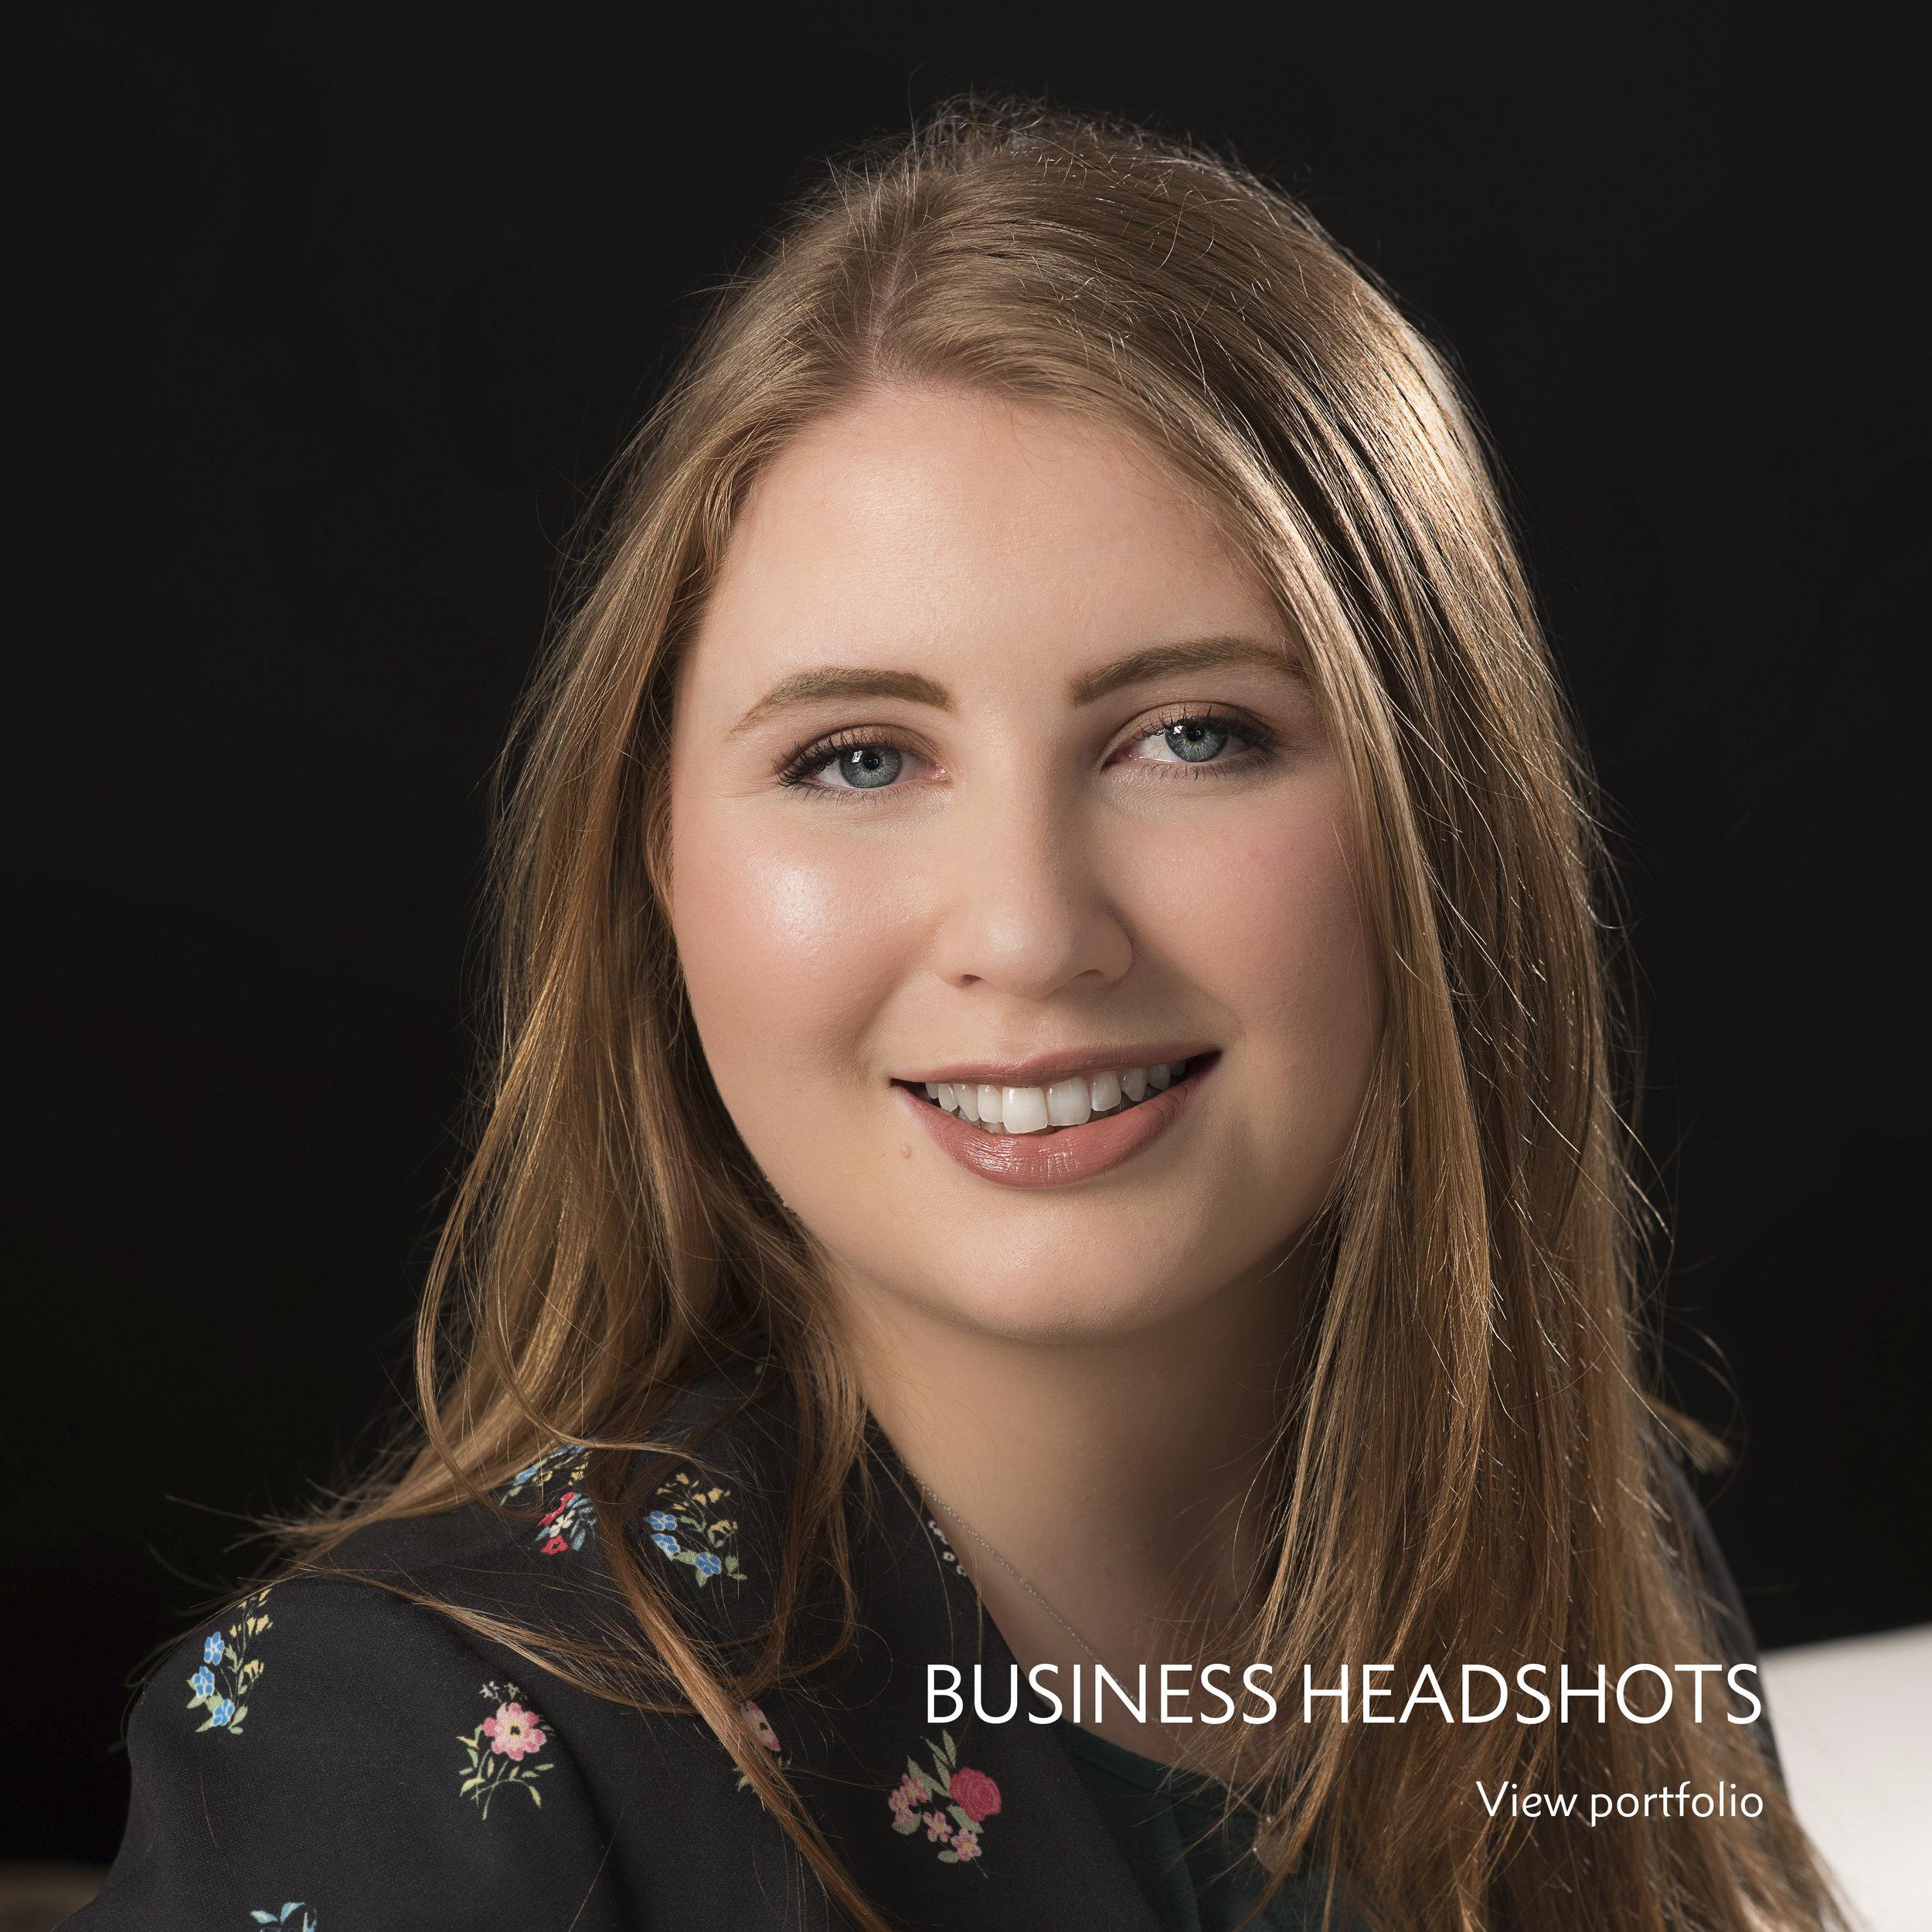 Business Headshots